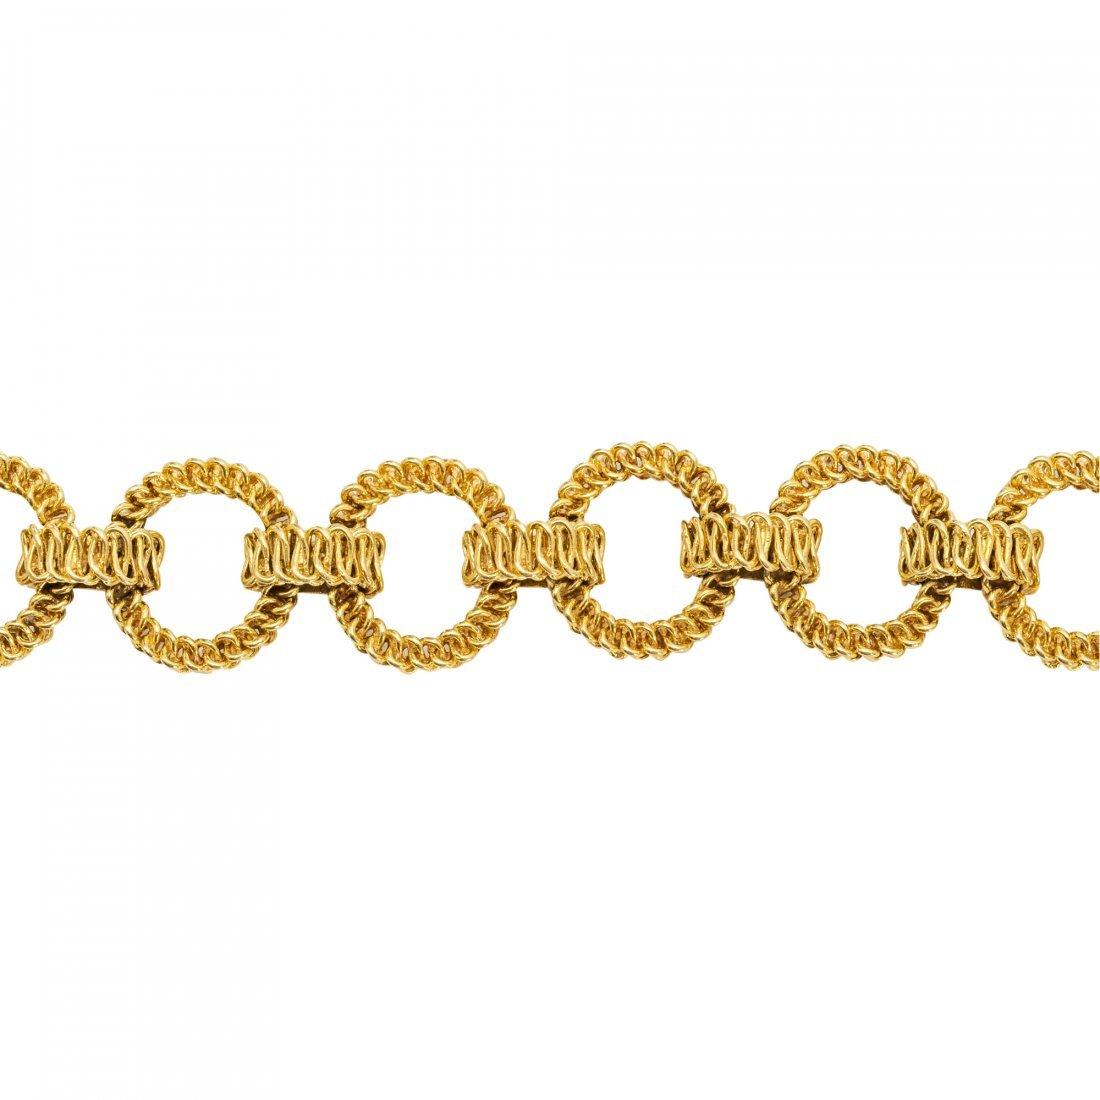 Tiffany & Co., 18kt Yellow Gold Bracelet - 2